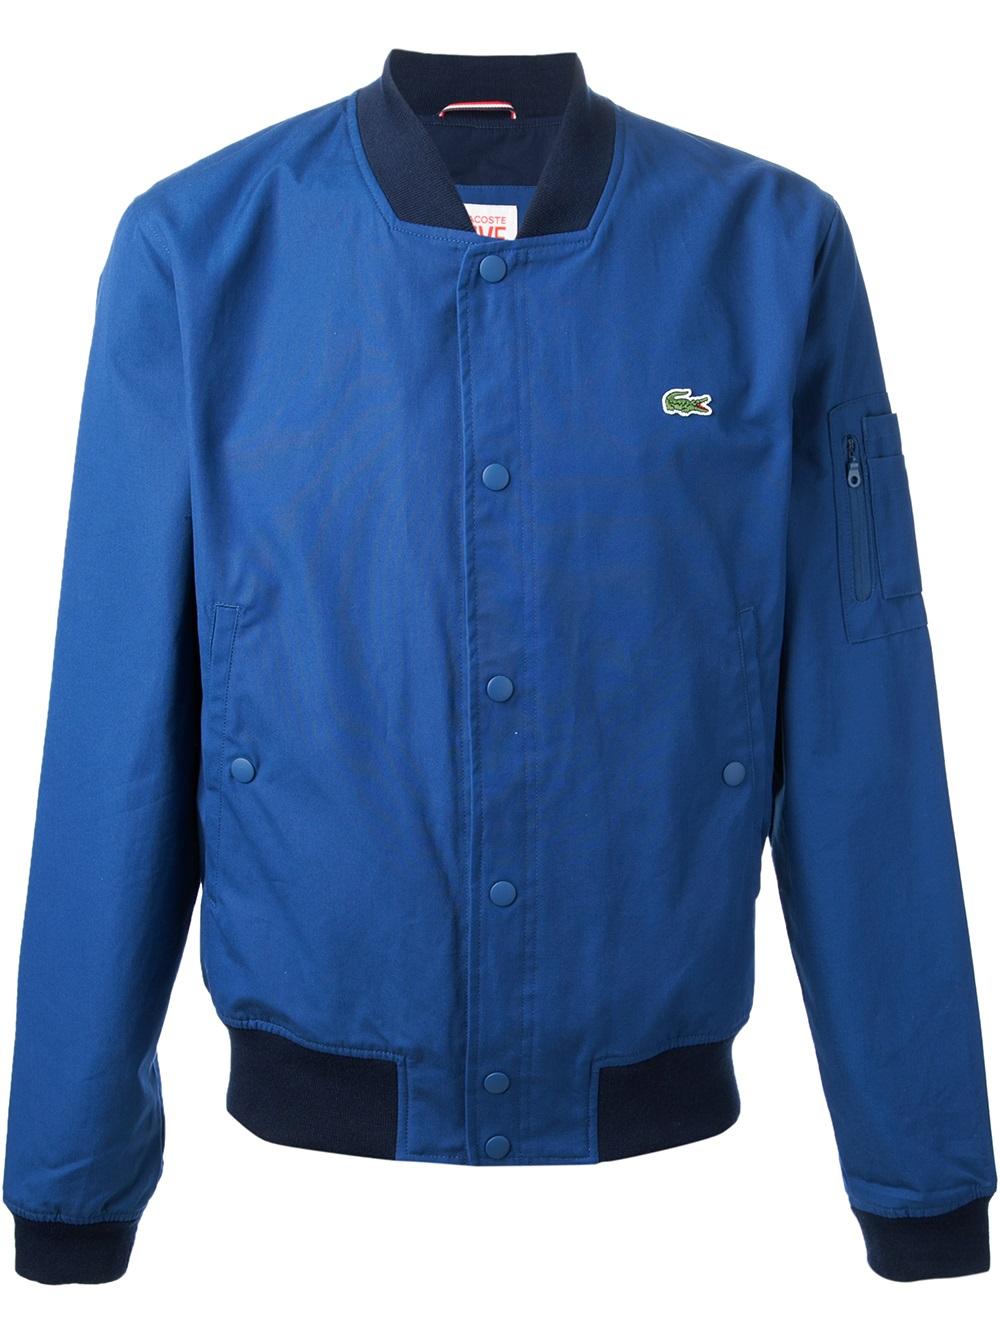 7c7eb2b8 Lacoste L!ive Blue Classic Bomber Jacket for men